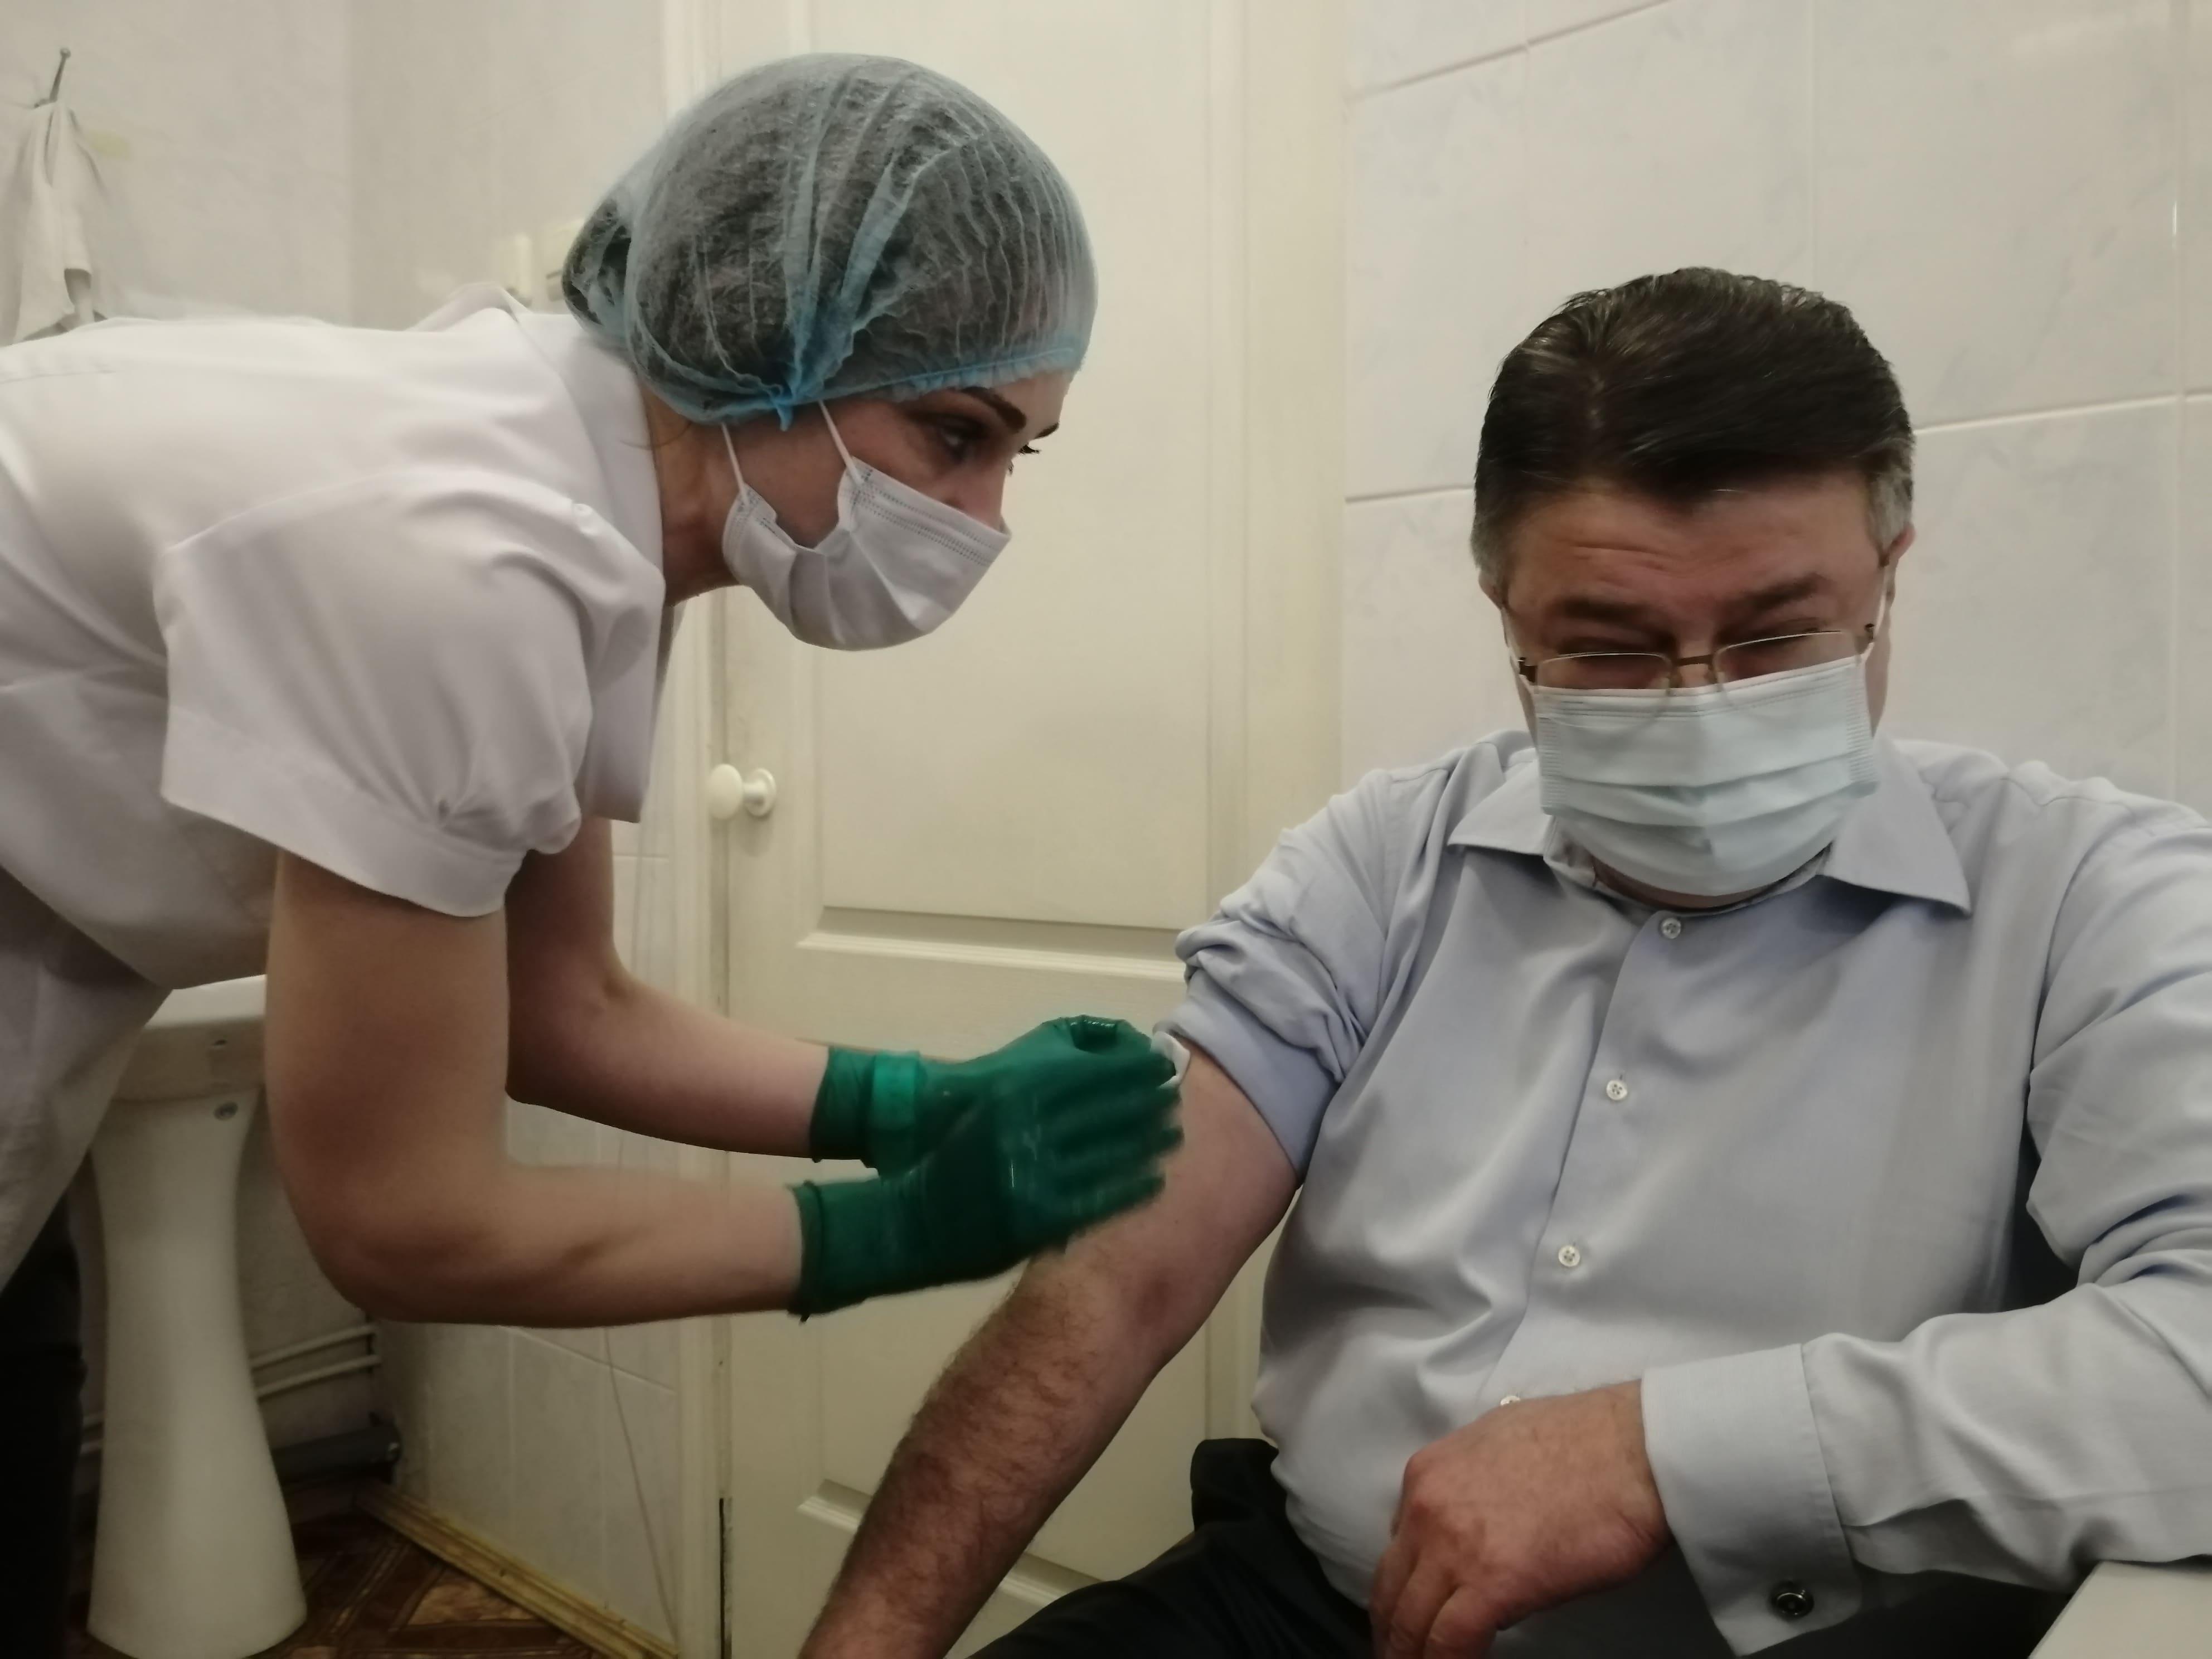 Министр здравоохранения Калужской области Алан Цкаев сделал прививку от коронавируса